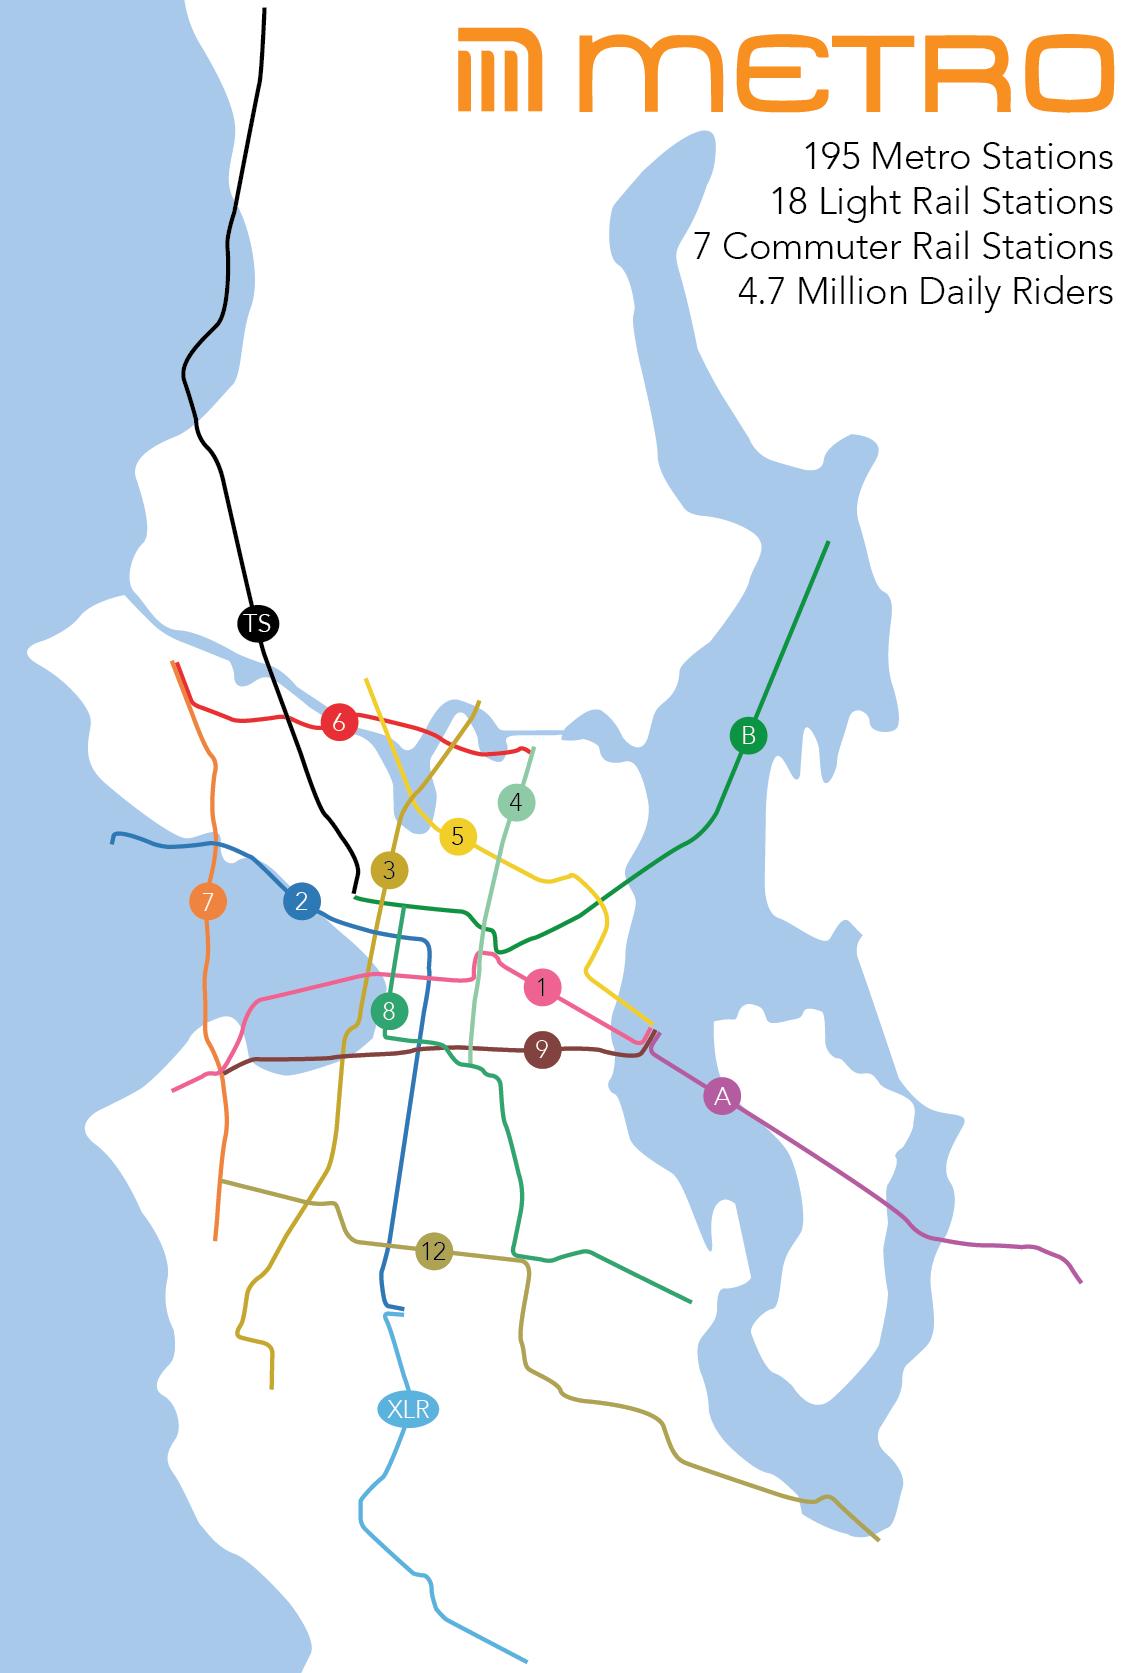 mexico-city-metro-seattle-overlay-01-01